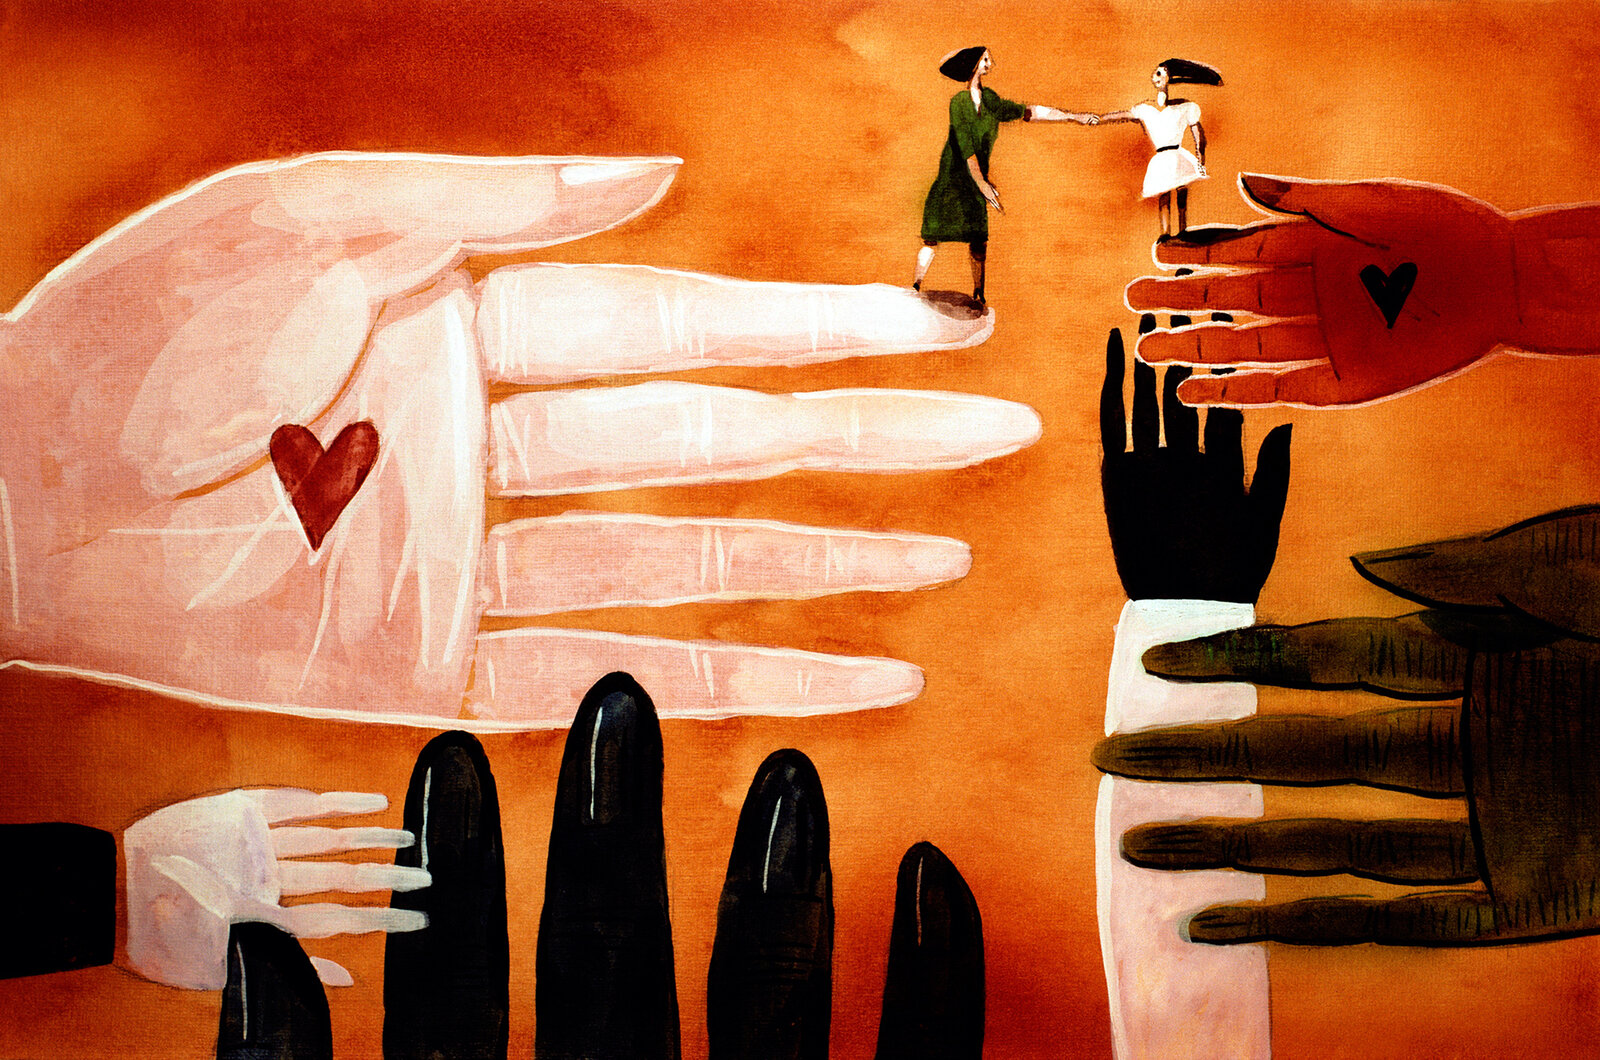 Todd Davidson/Illustration Works/Corbis